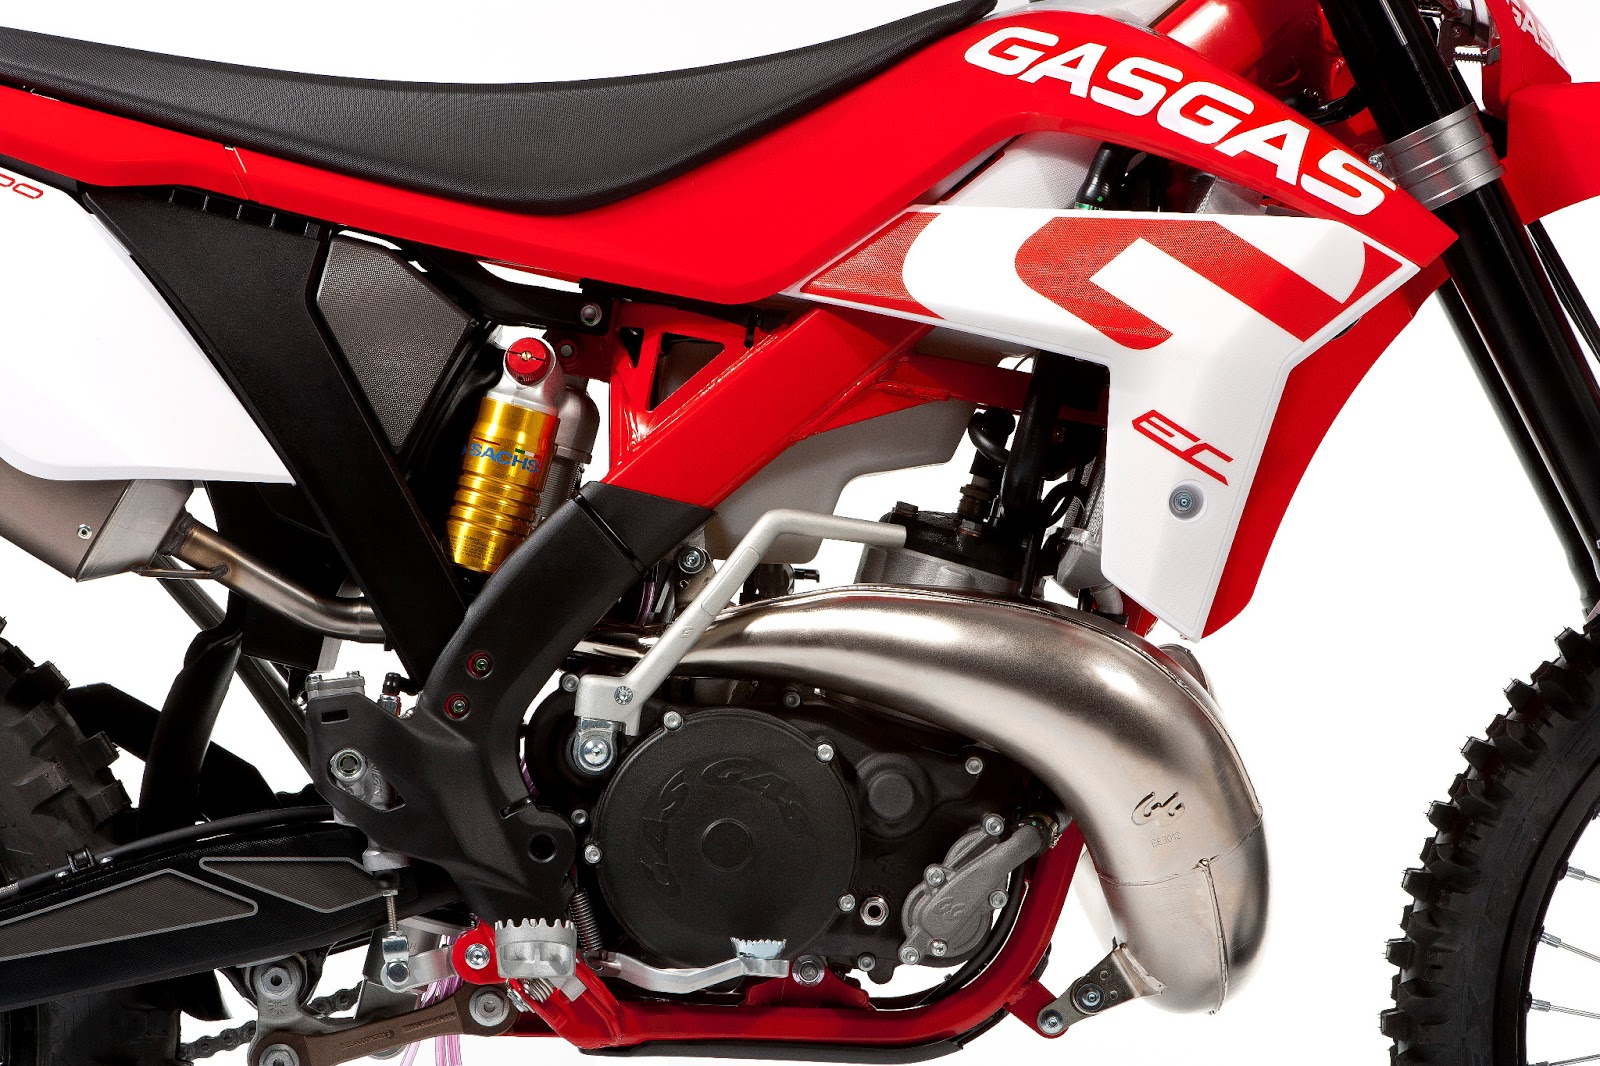 2013 gas gas ec 300 latest motorcycle models. Black Bedroom Furniture Sets. Home Design Ideas